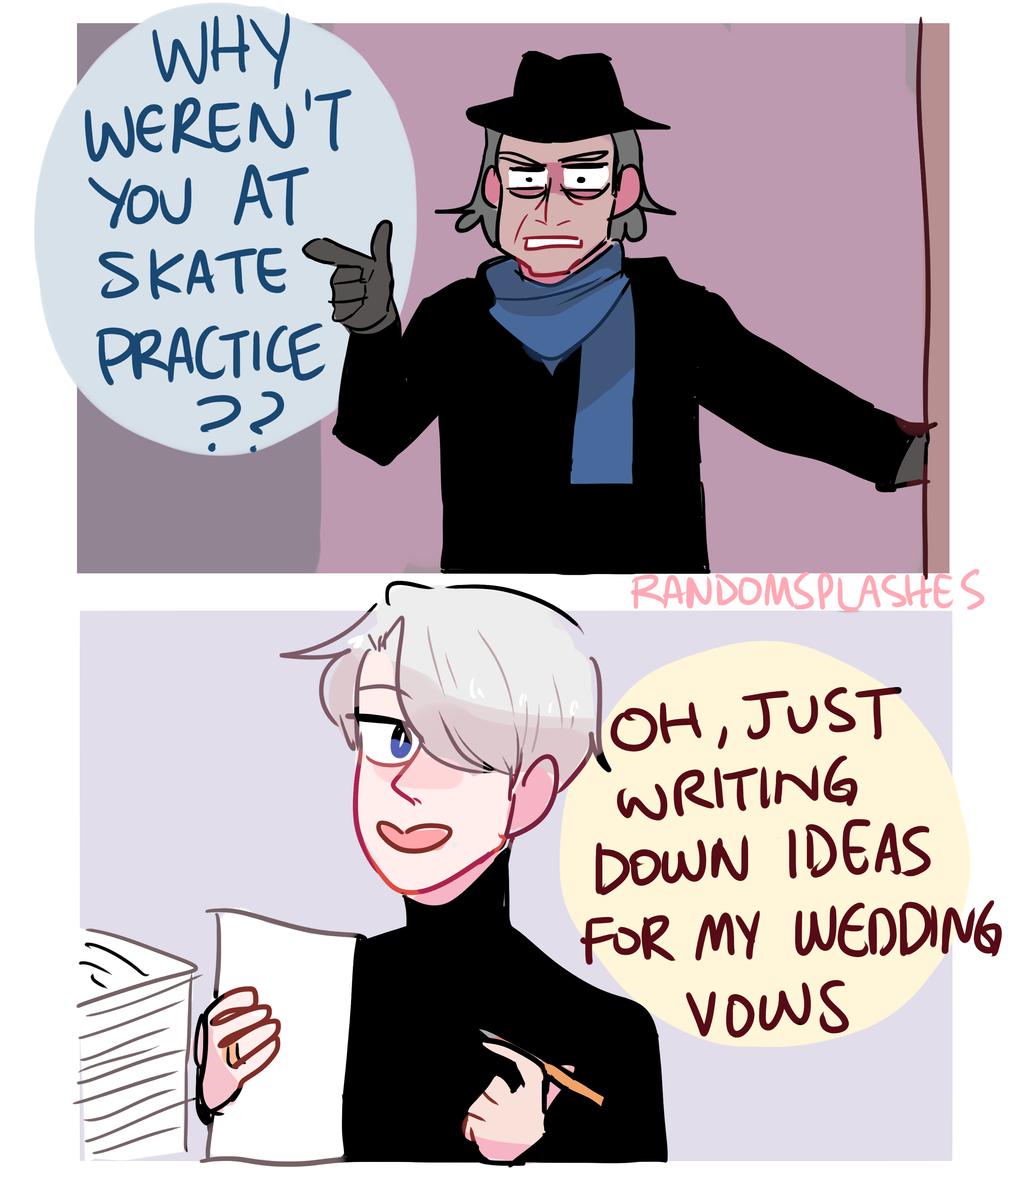 YOI: WHY WEREN'T YOU AT SKATE PRACTICE by Randomsplashes on DeviantArt